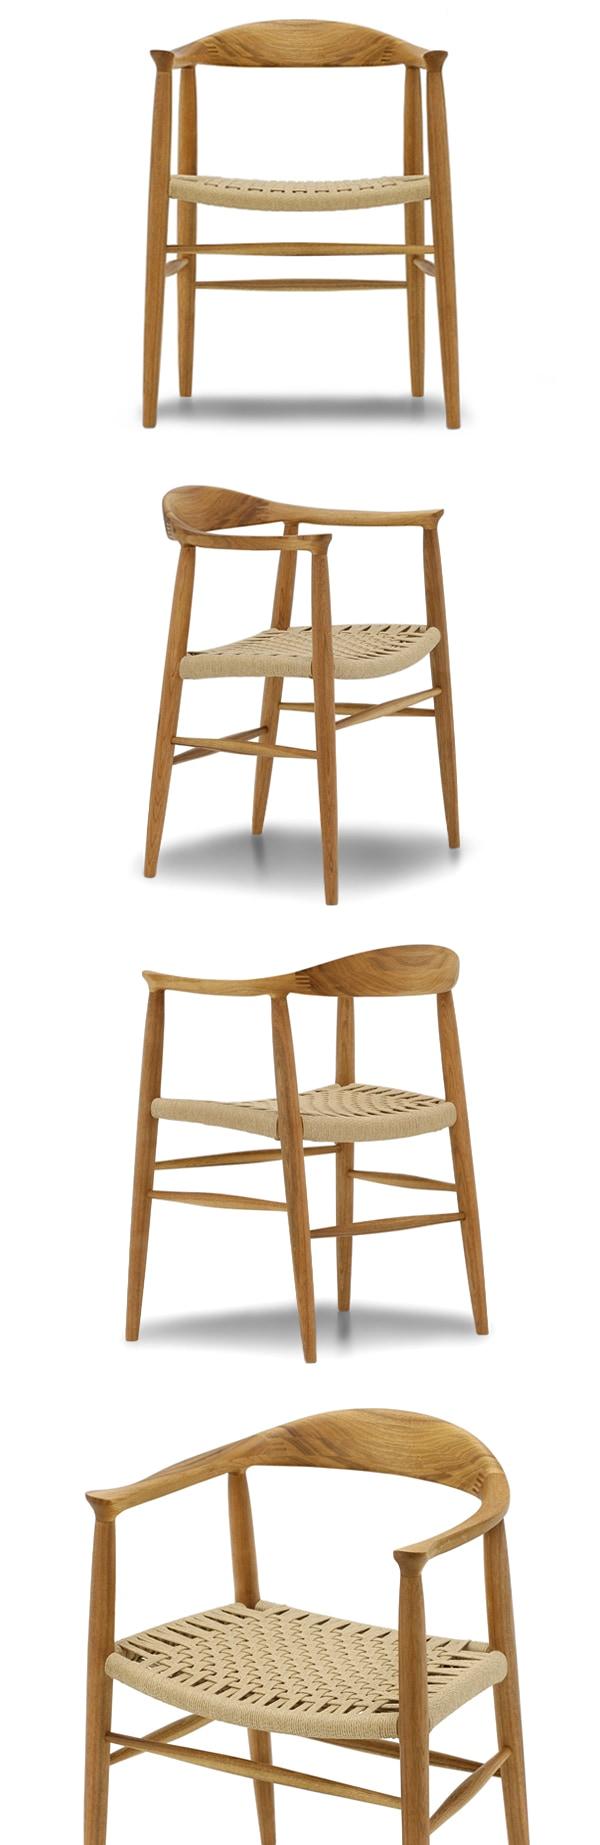 職人,手作り,家具,椅子,北欧,天然木